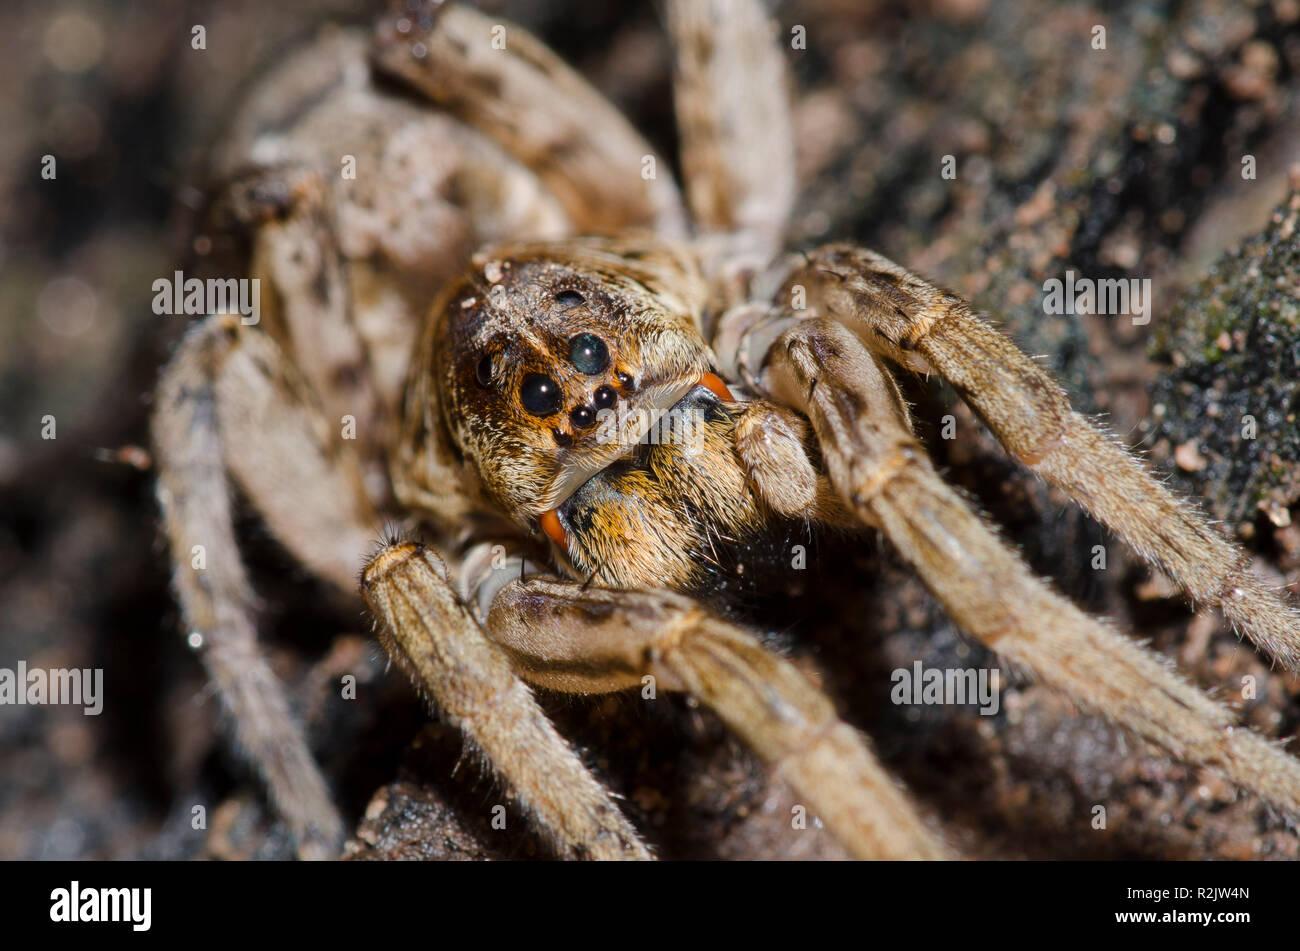 Wolf Spider, Hogna baltimoriana - Stock Image